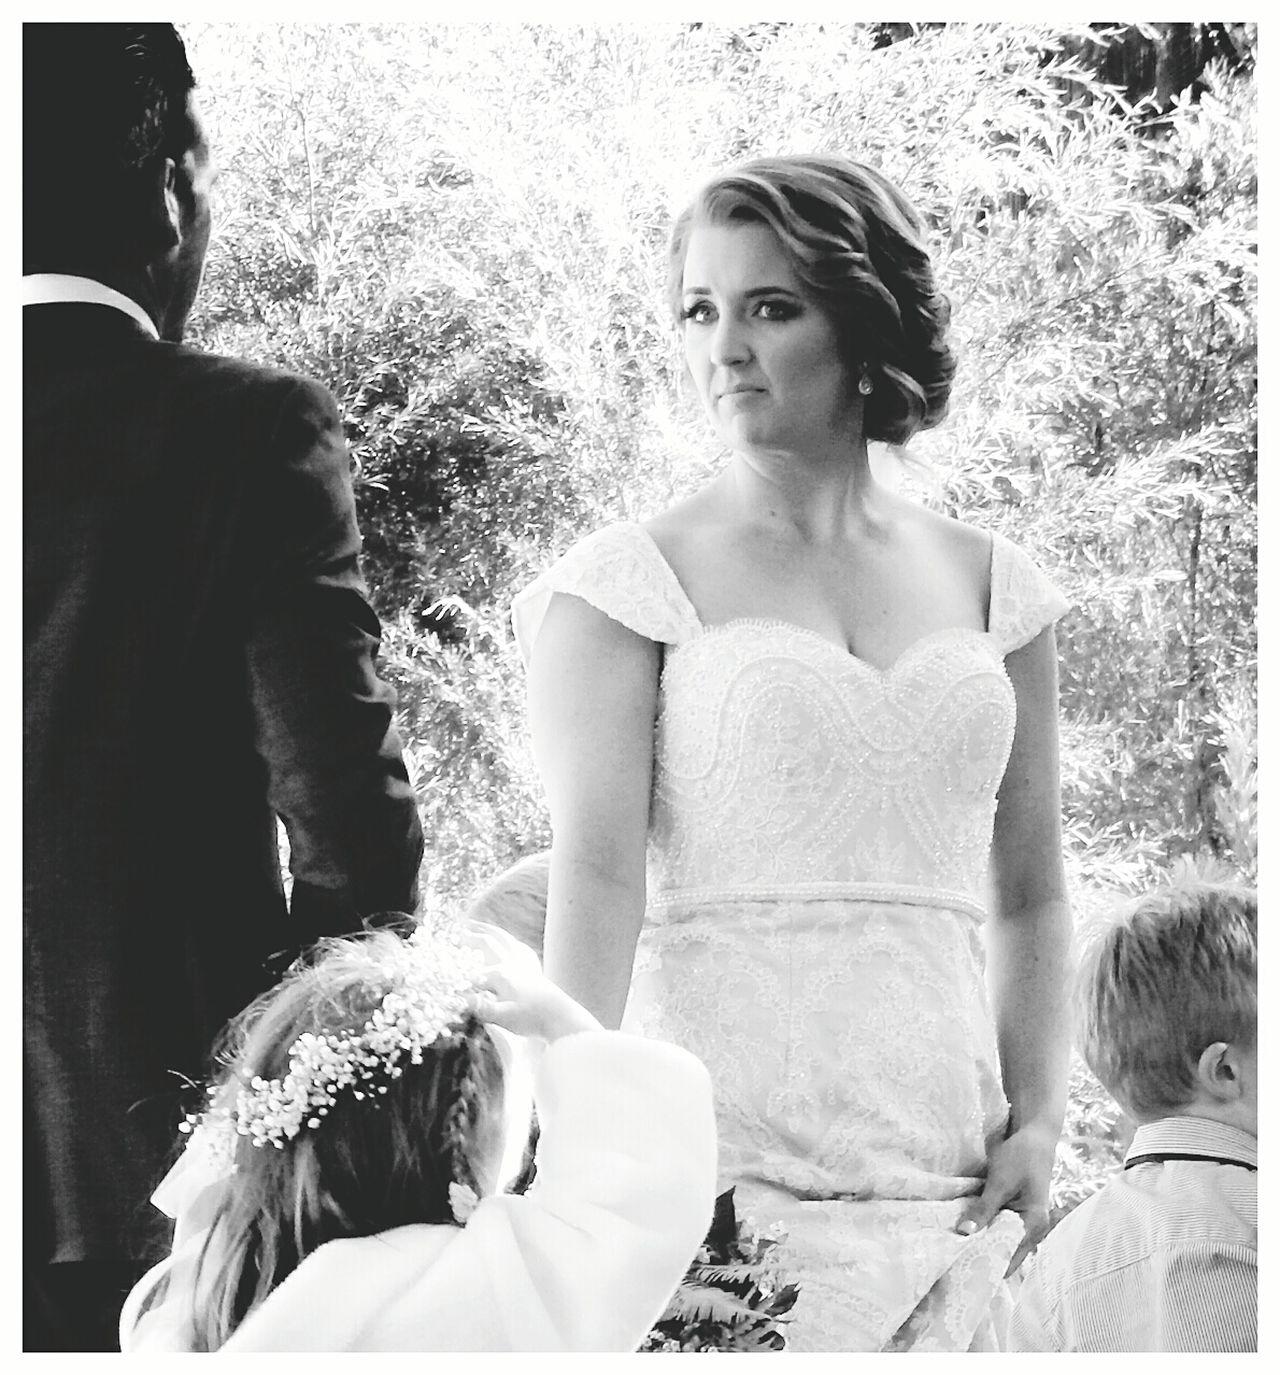 Weddingphotography Weddingstory Weddinginspiration